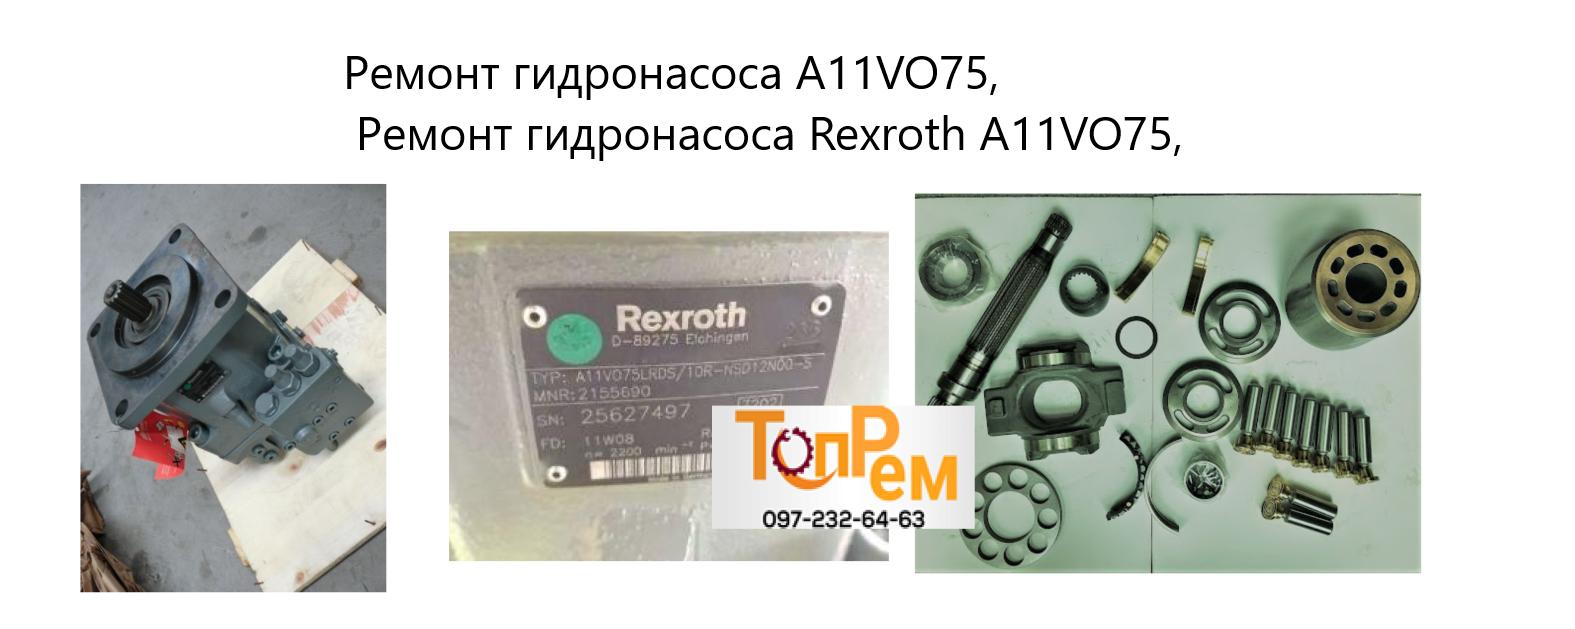 Ремонт гидронасоса A11VO75